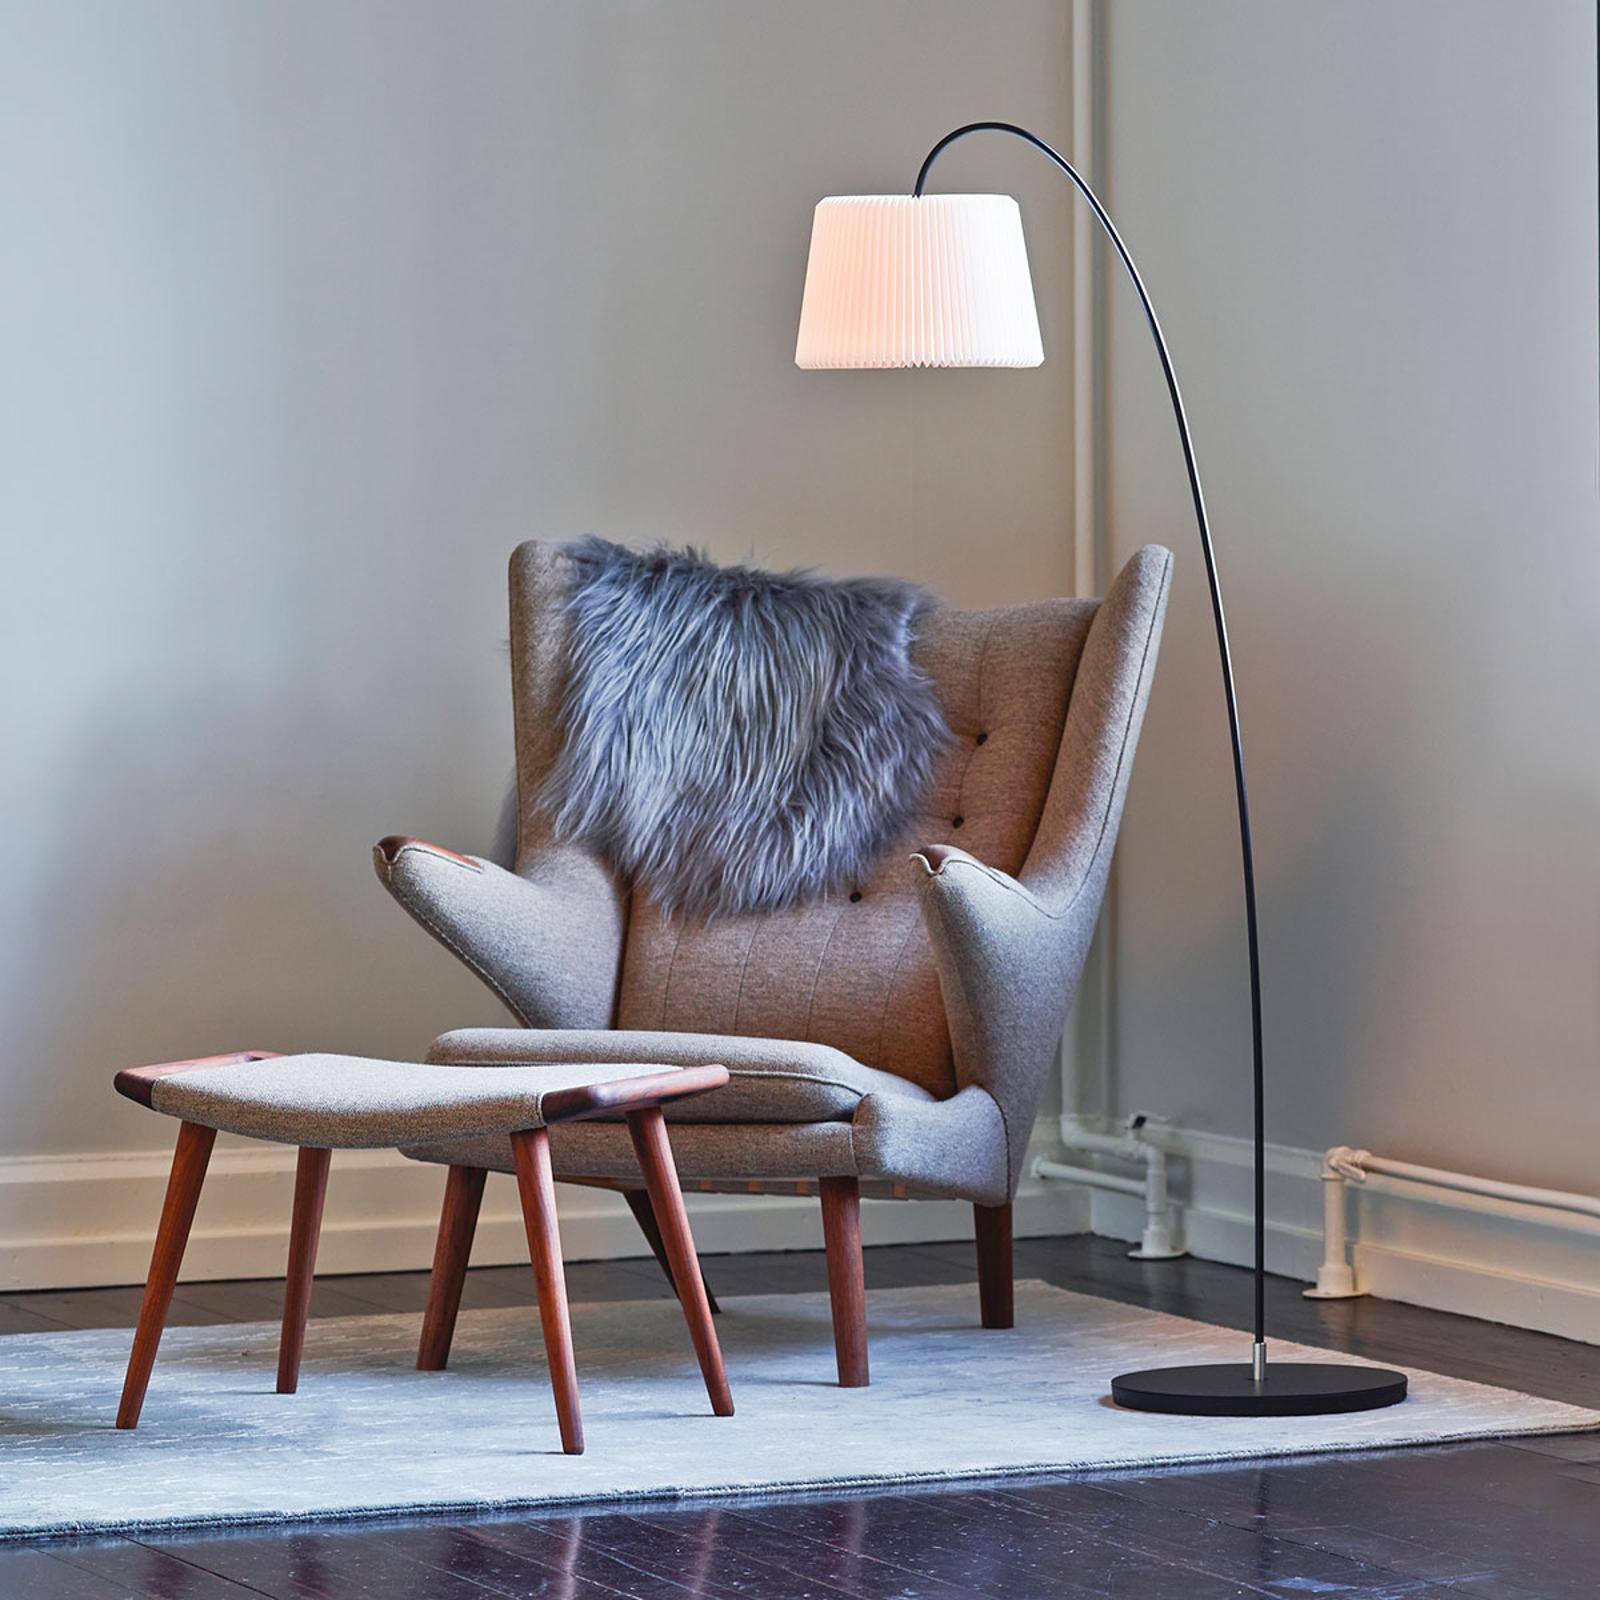 LE KLINT Snowdrop vloerlamp, kunststofkap wit